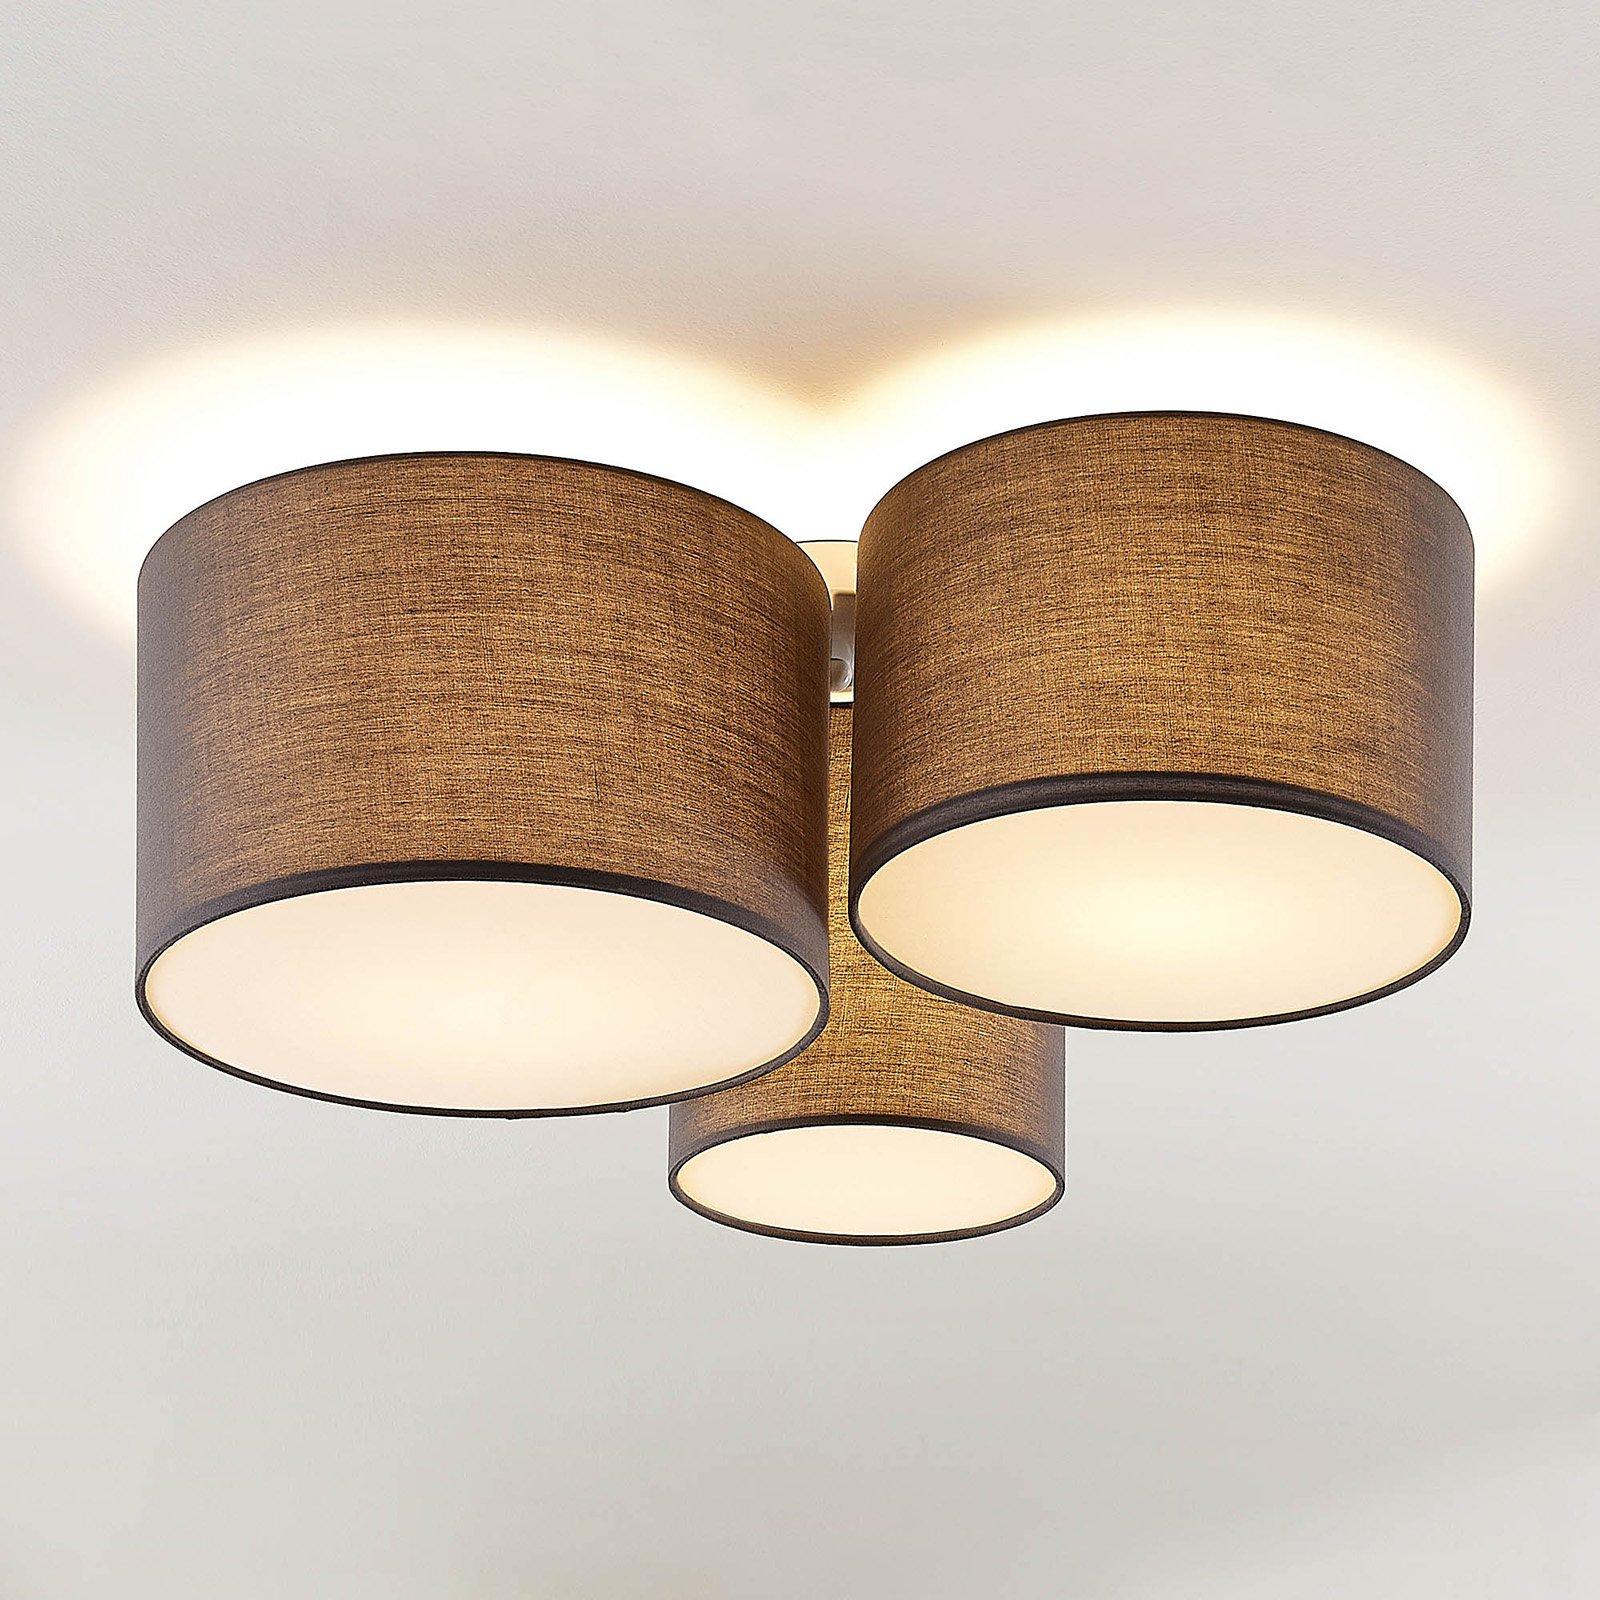 Lindby Laurenz taklampe, 3 lyskilder, grå